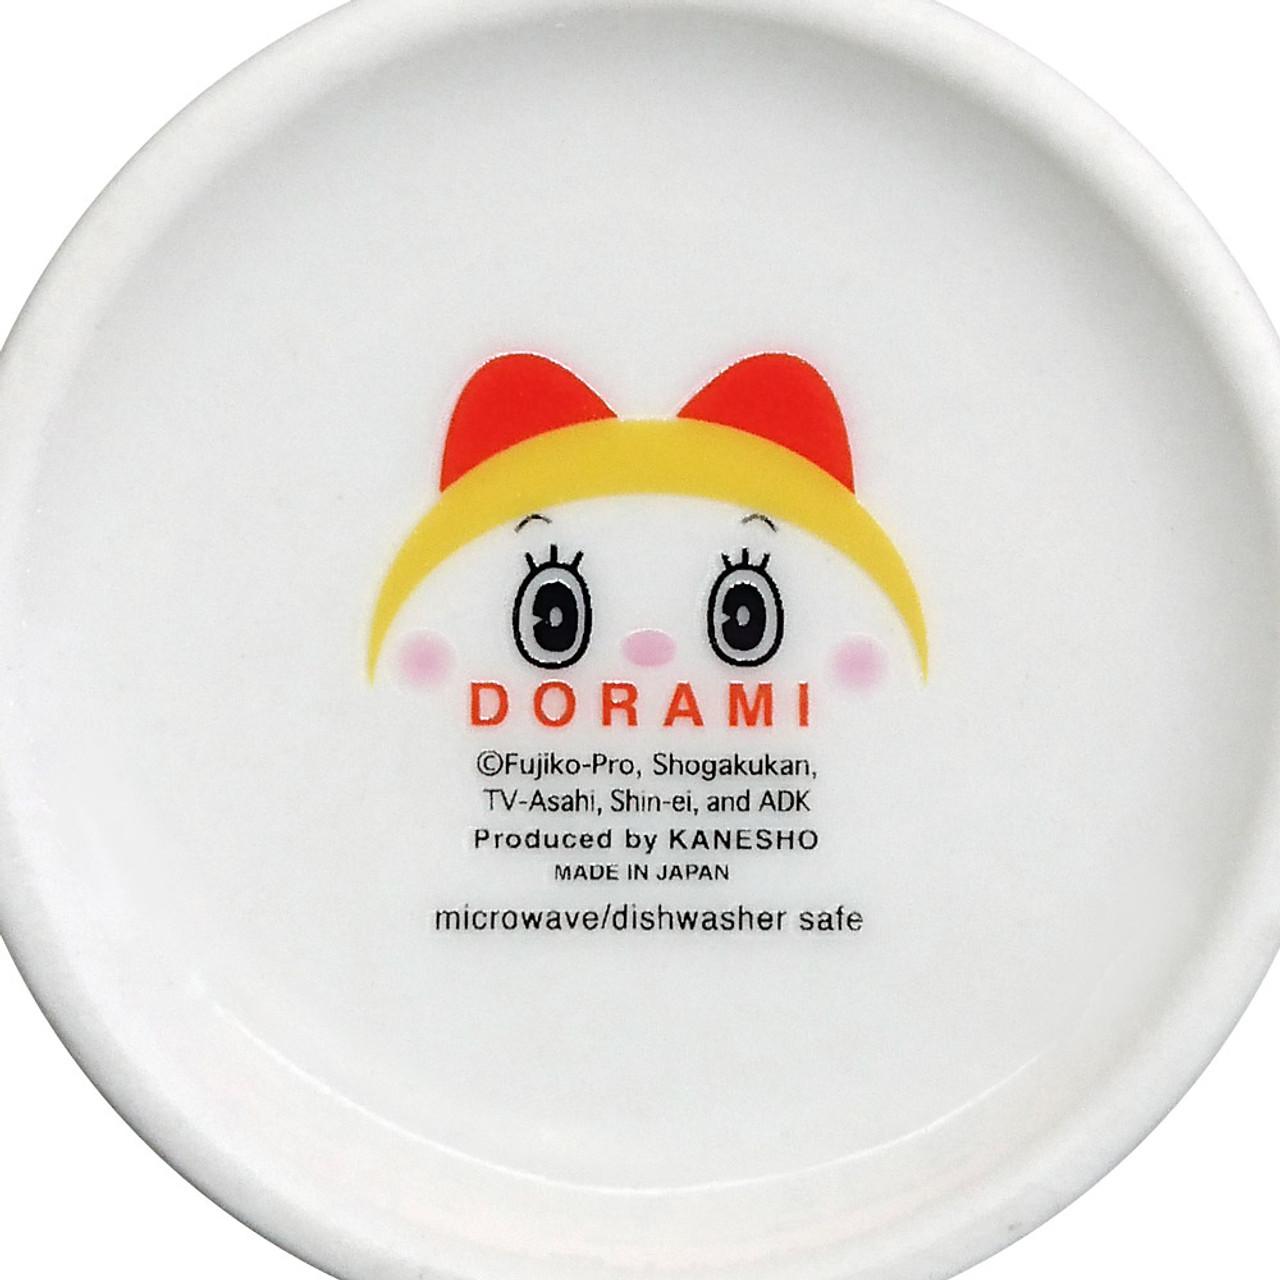 Japan Doraemon Face Porcelain Coffee Cup - Dorami ( Bottom View )